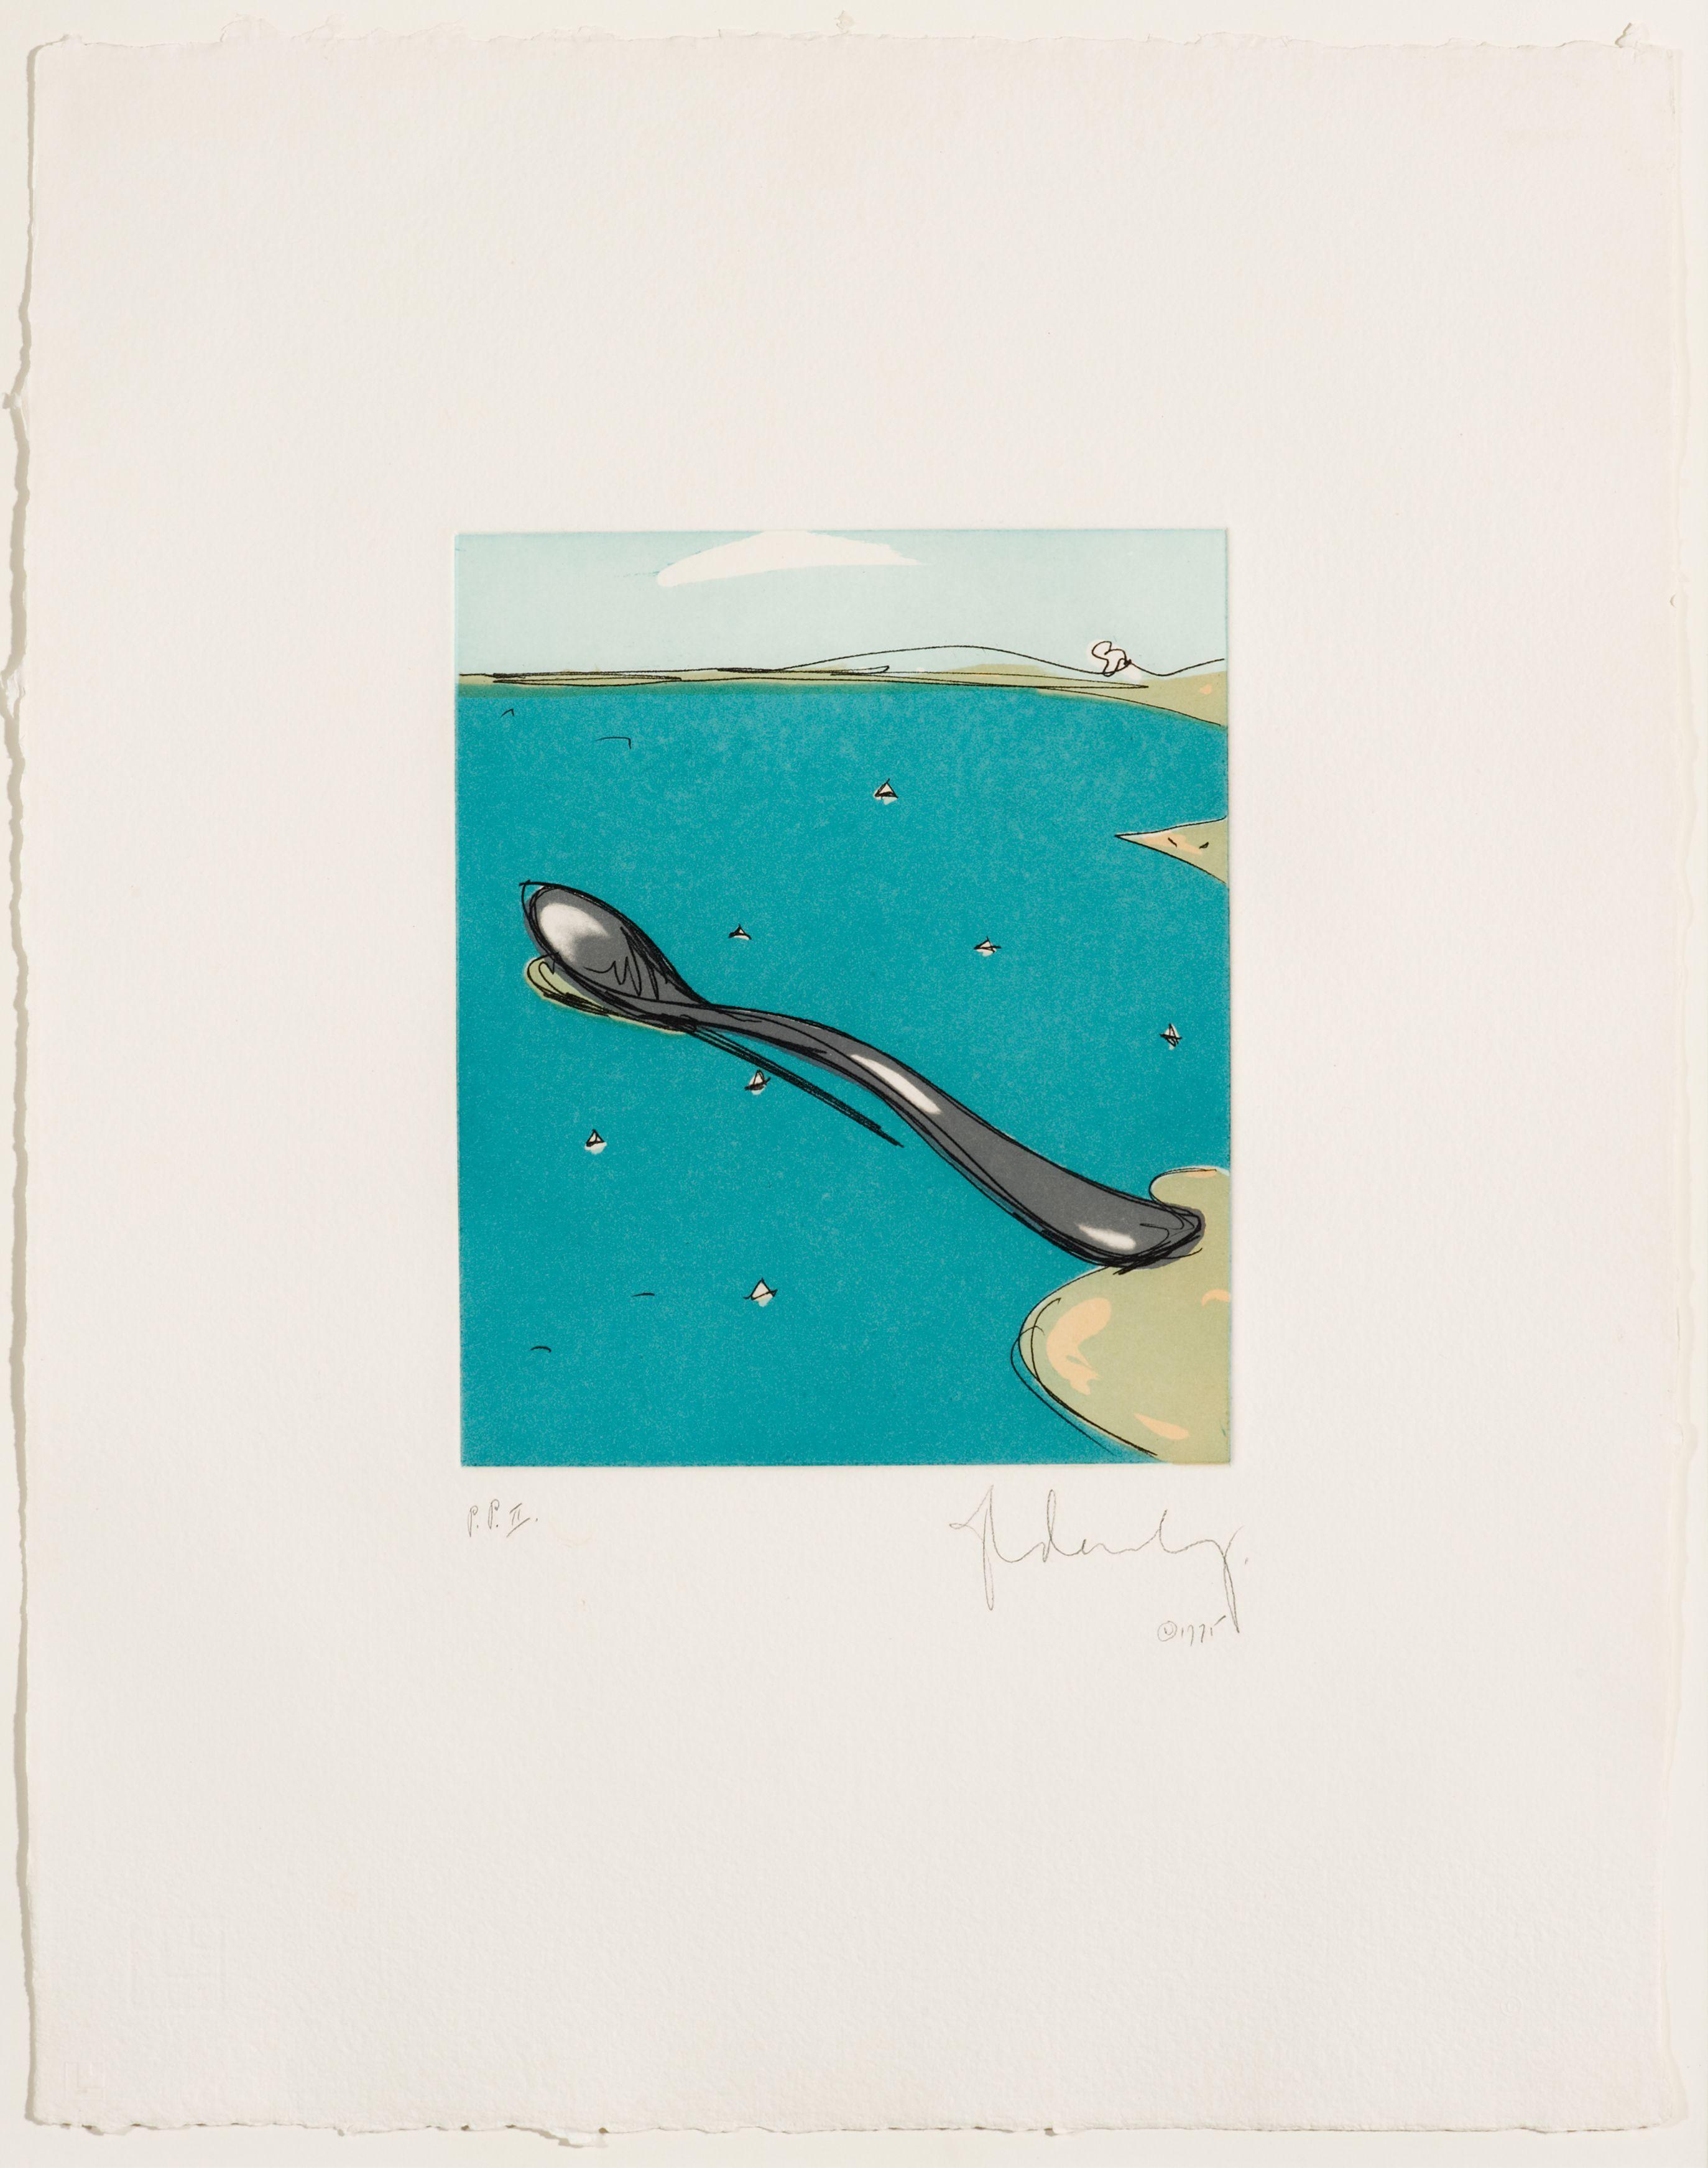 Important Art by Claes Oldenburg